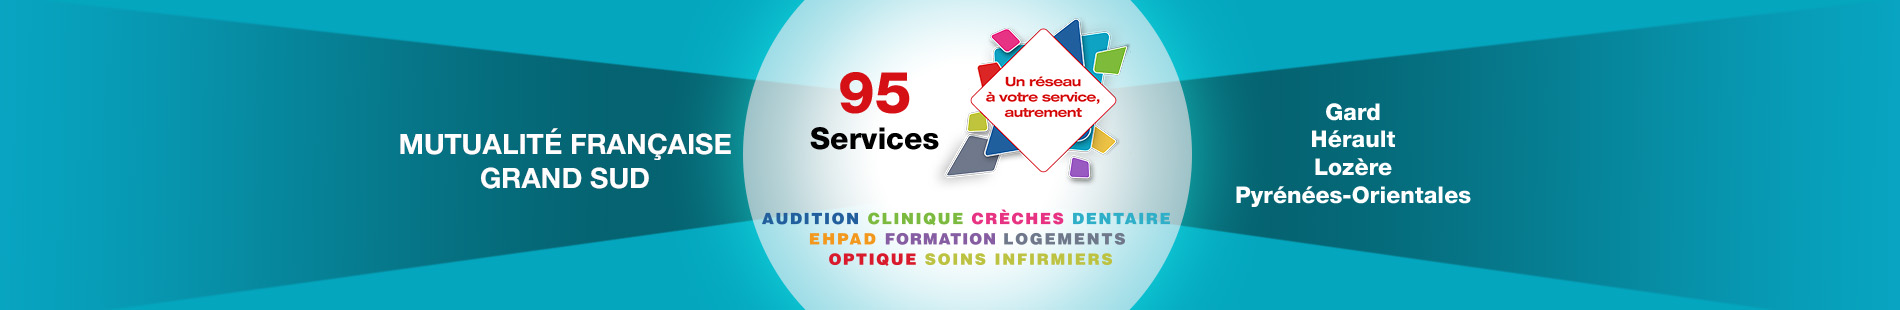 MFGS - 95 services